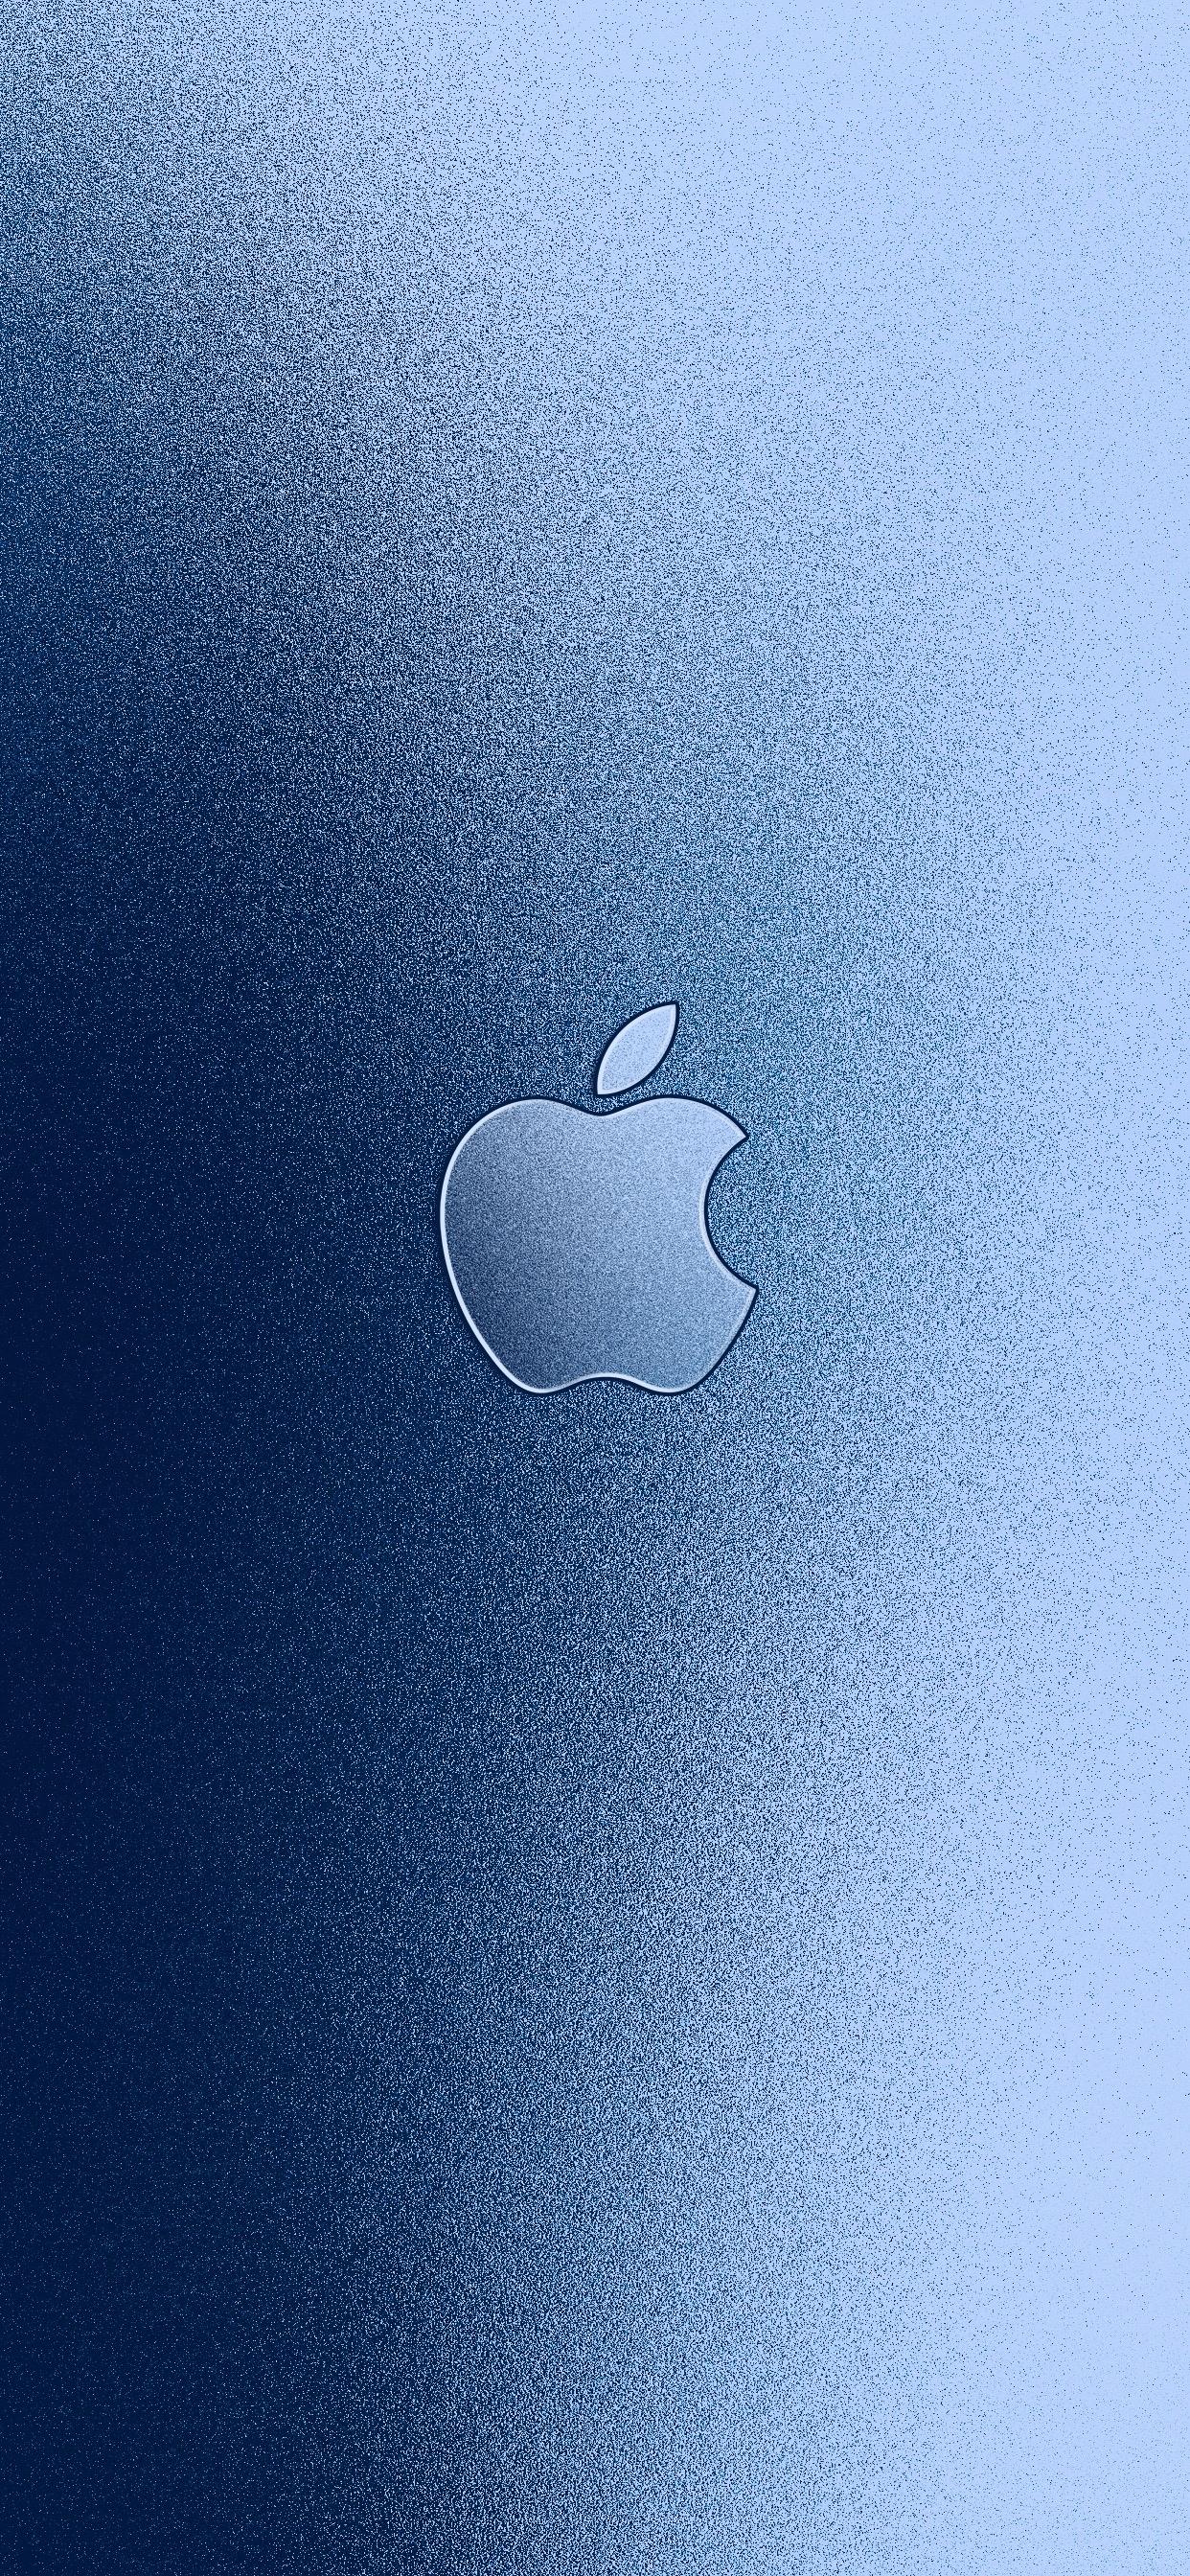 33 Iphone Logo Wallpapers On Wallpapersafari